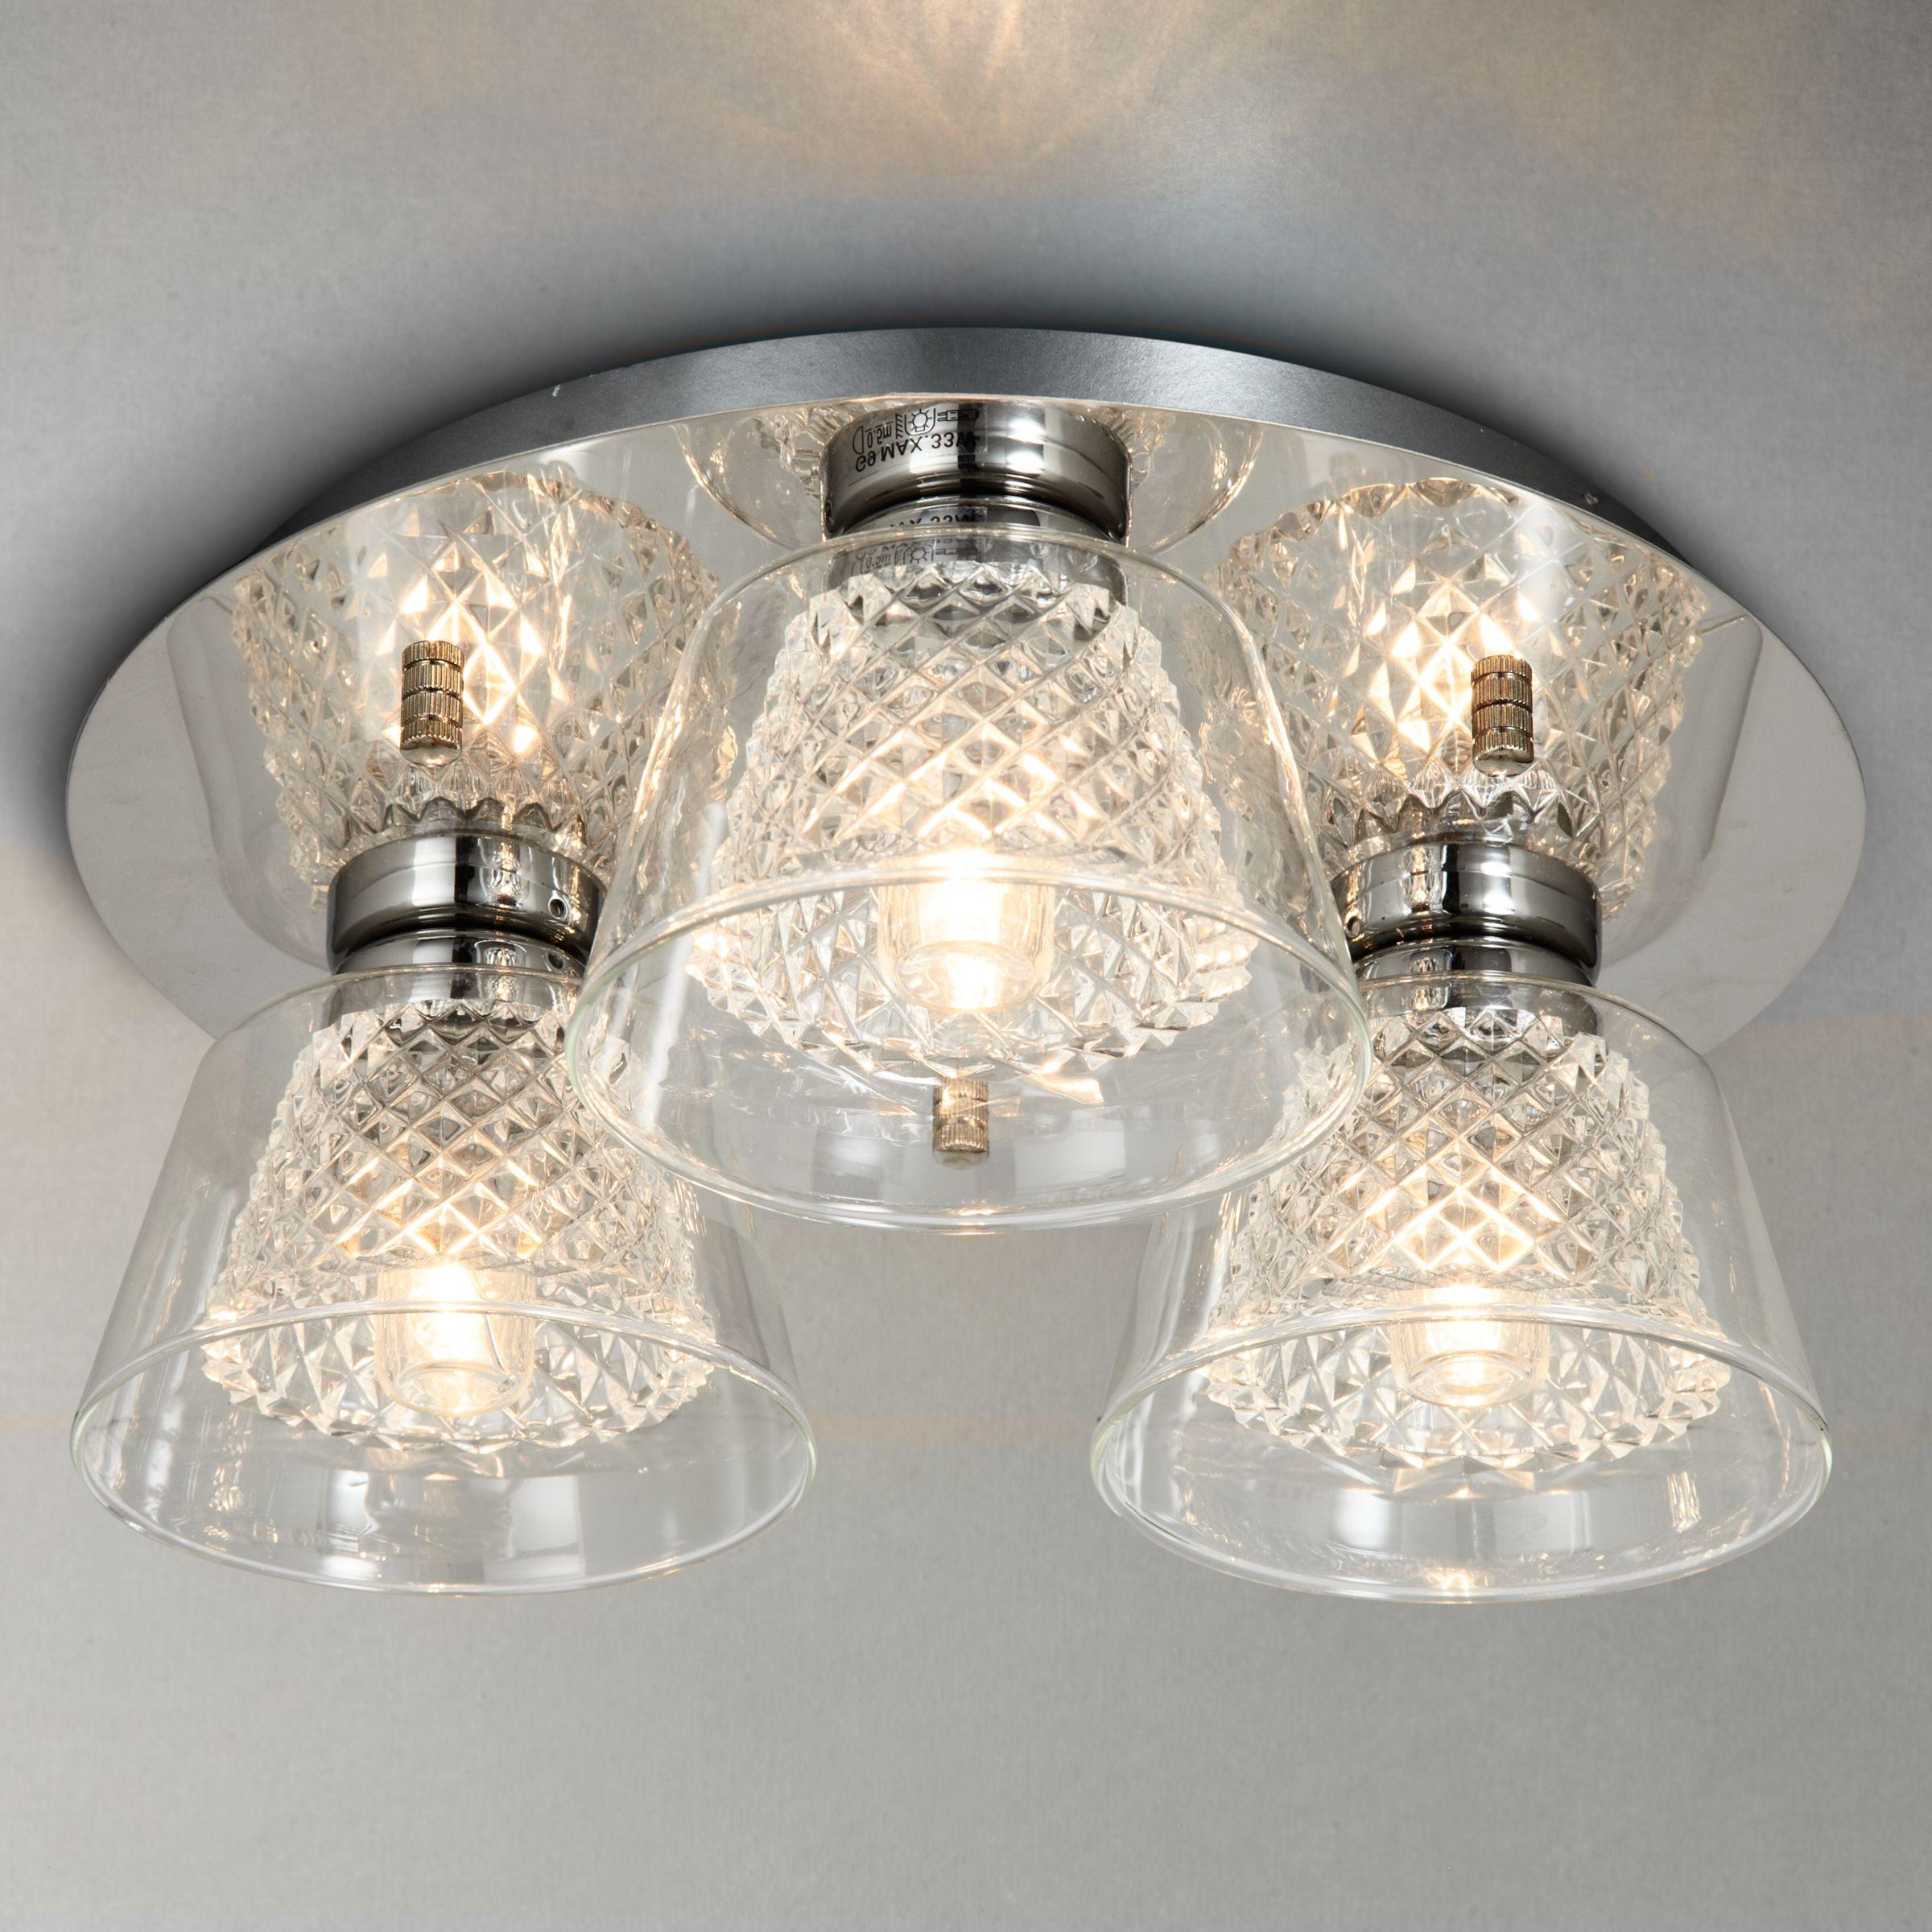 i4DZINE i4DZINE Horatio Cut Crystal Bathroom Flush Light, 3 Light